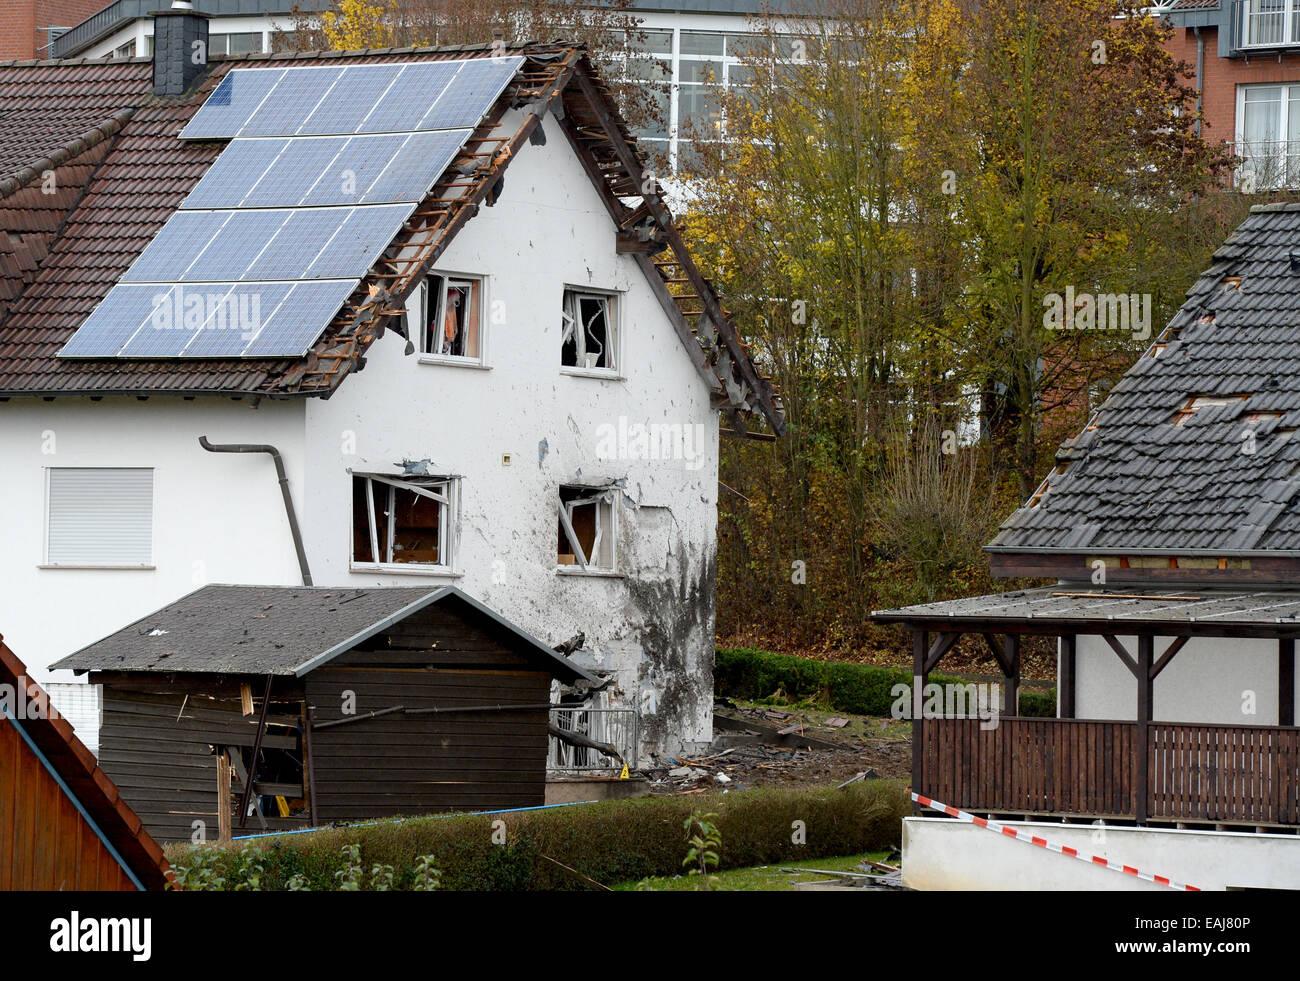 Großartig Schaltungen Nach Hause Ideen - Schaltplan Serie Circuit ...